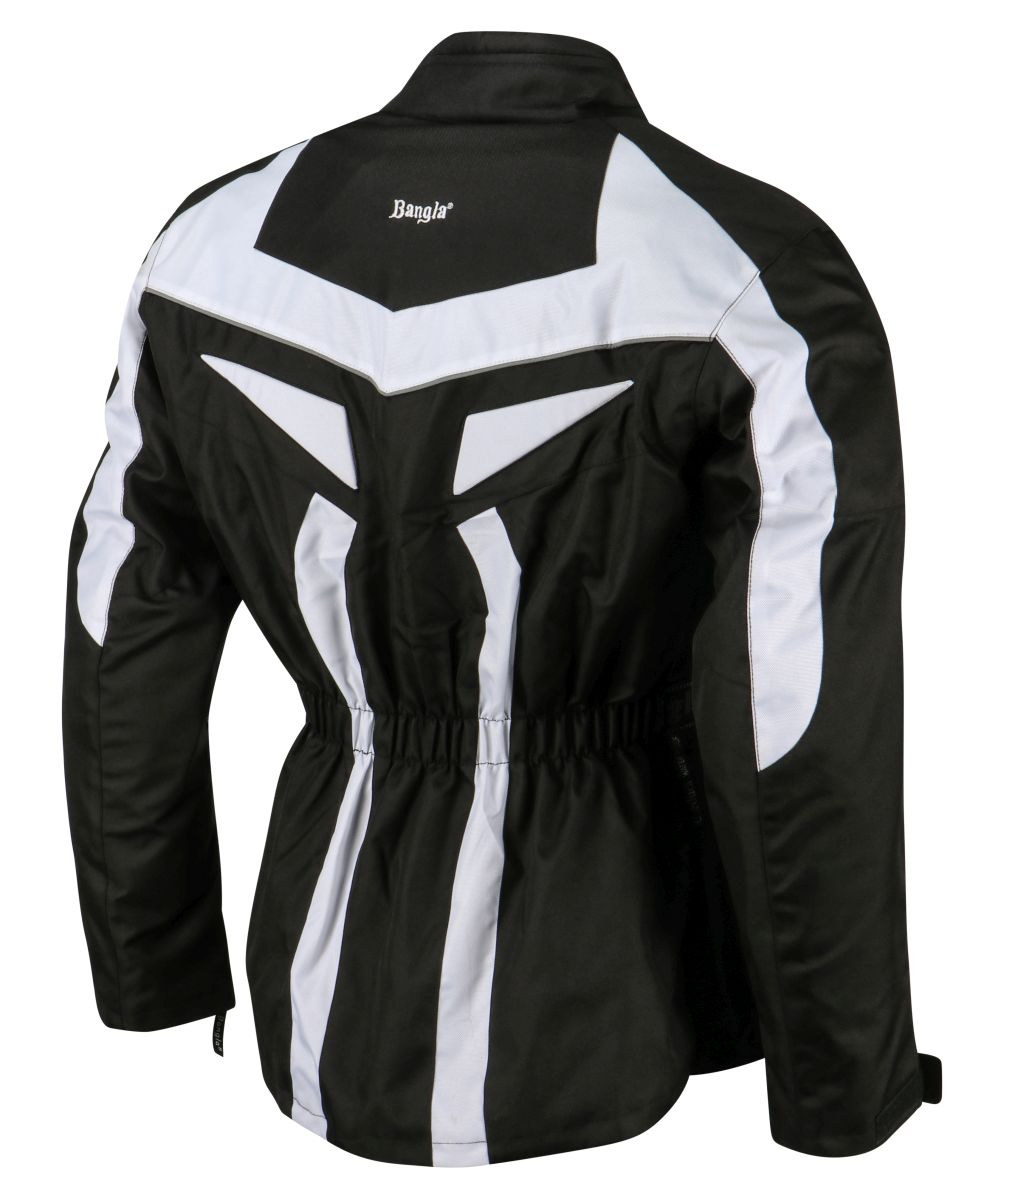 Bangla Motorrad Jacke Motorradjacke Textil Cordura schwarz weiss S - 6 XL